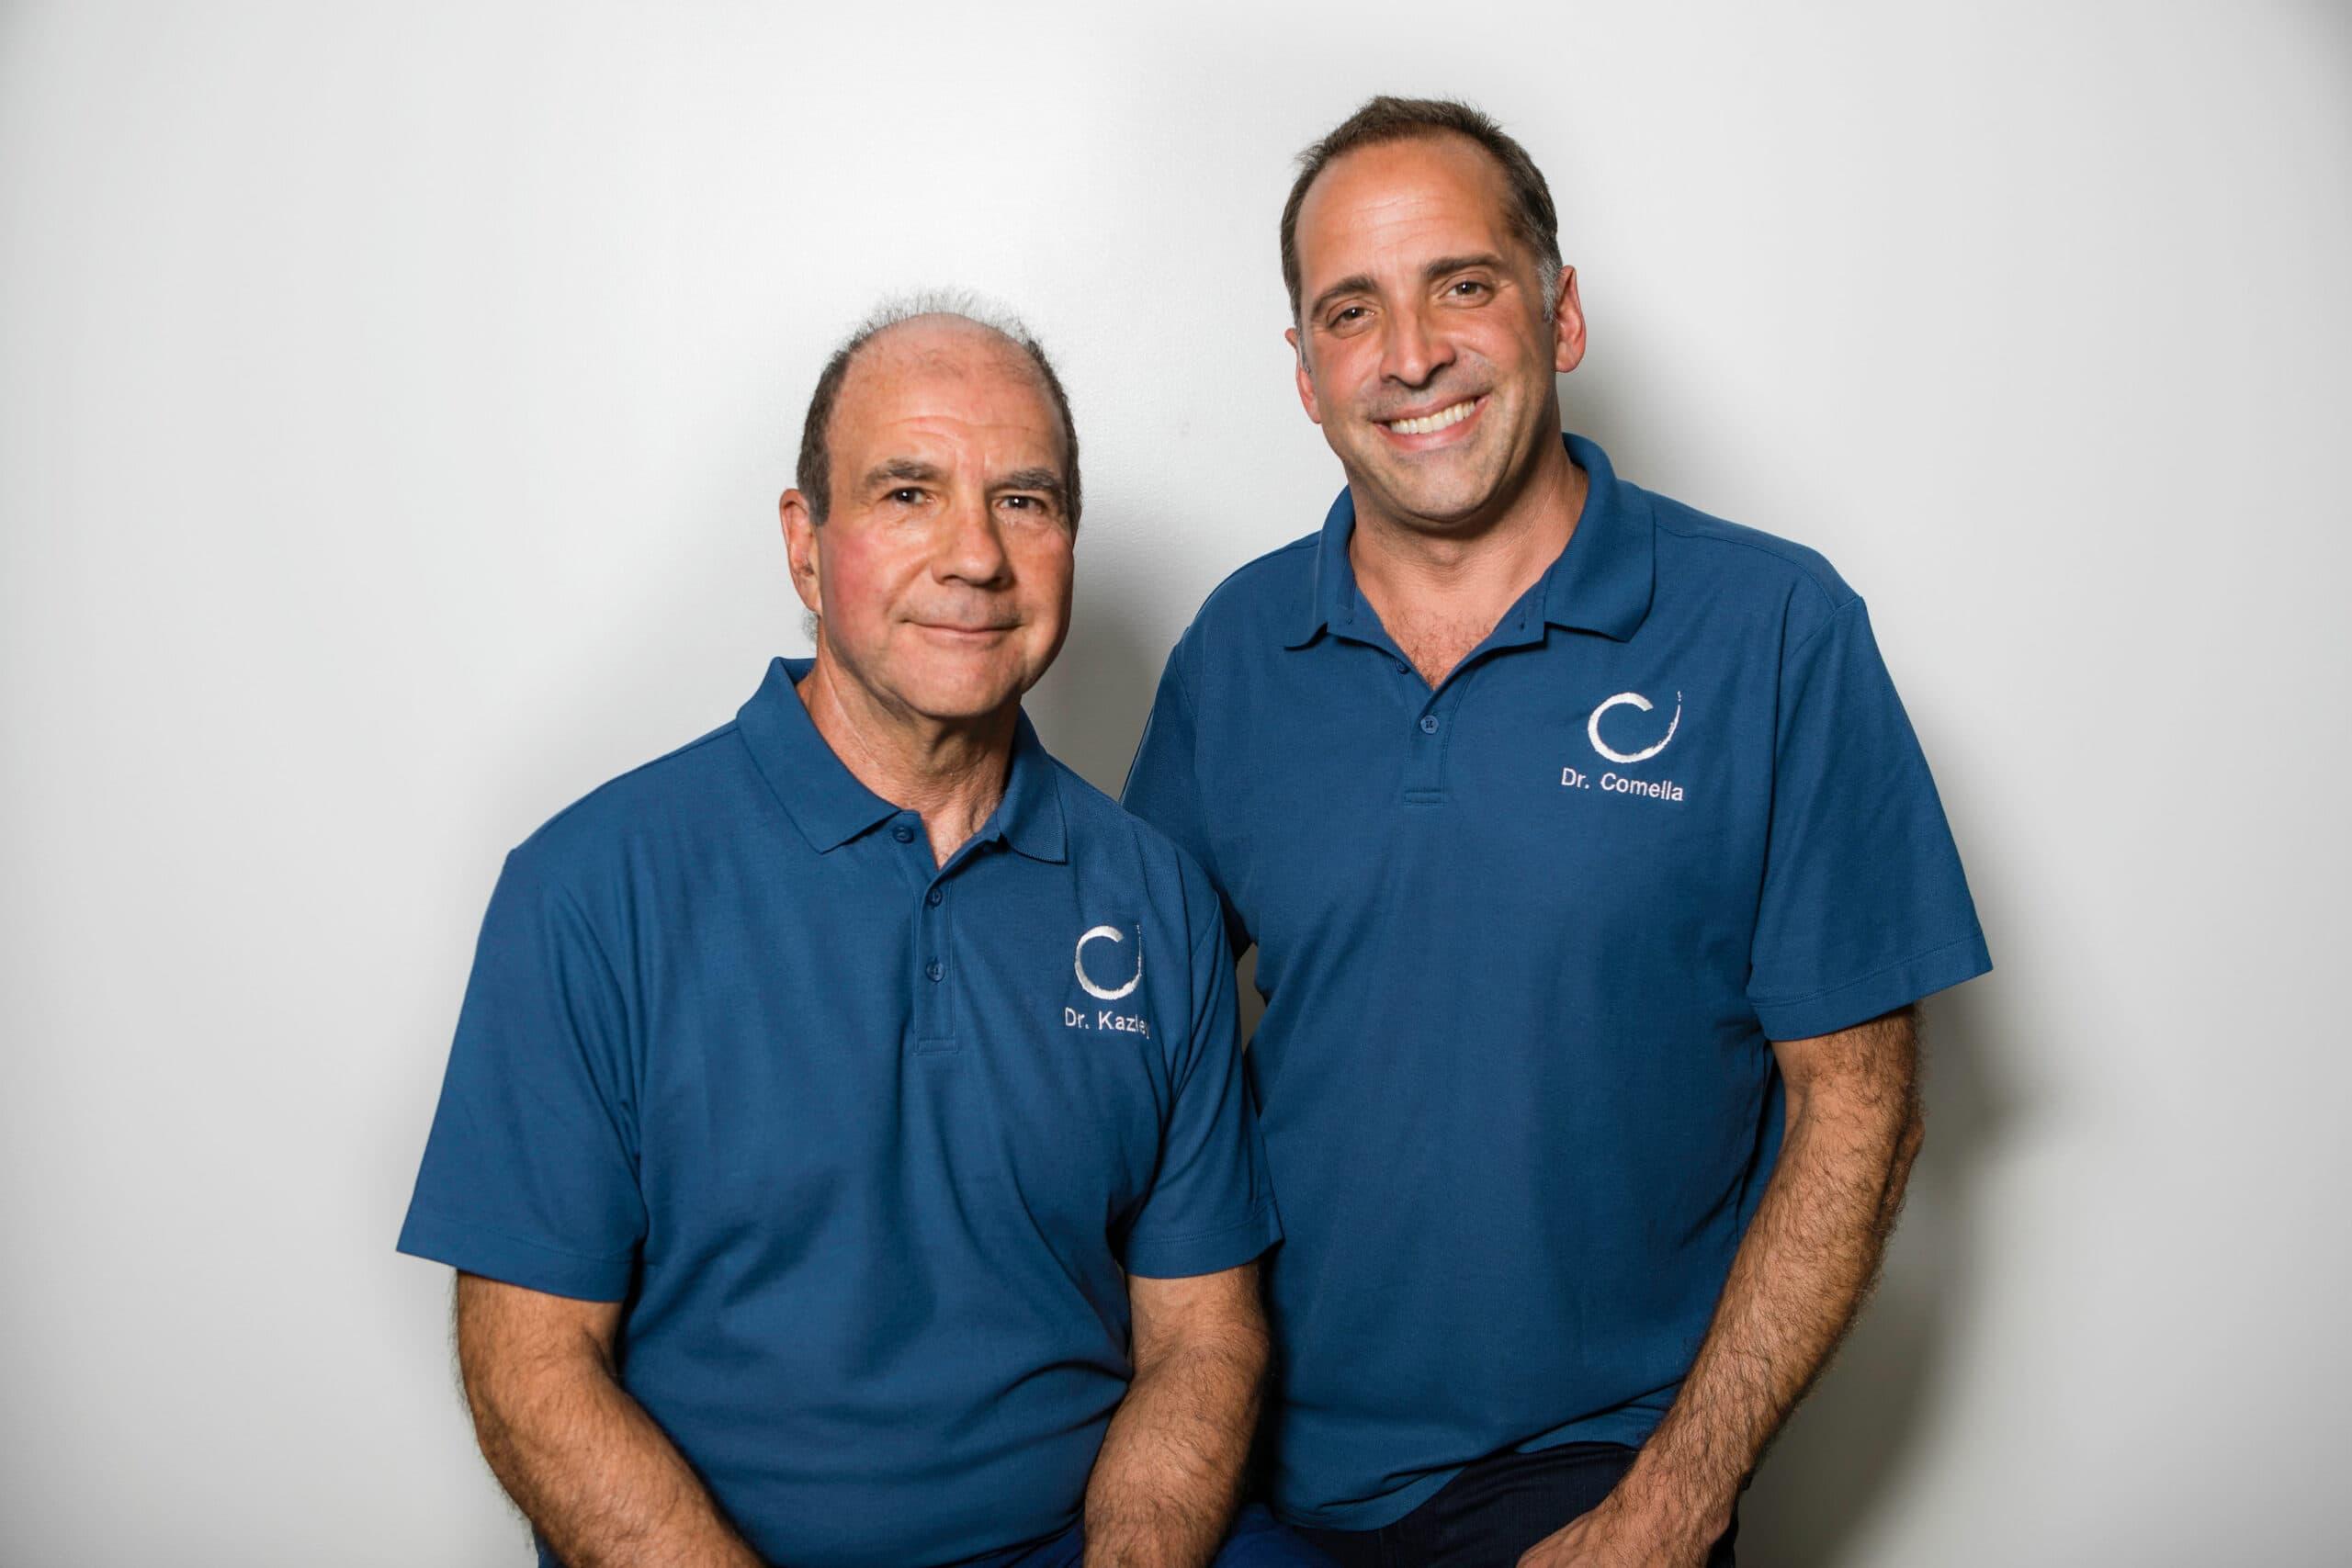 Comella Orthodontics Rochester New York Staff Portraits 3 scaled - Meet Dr. Steven Kazley